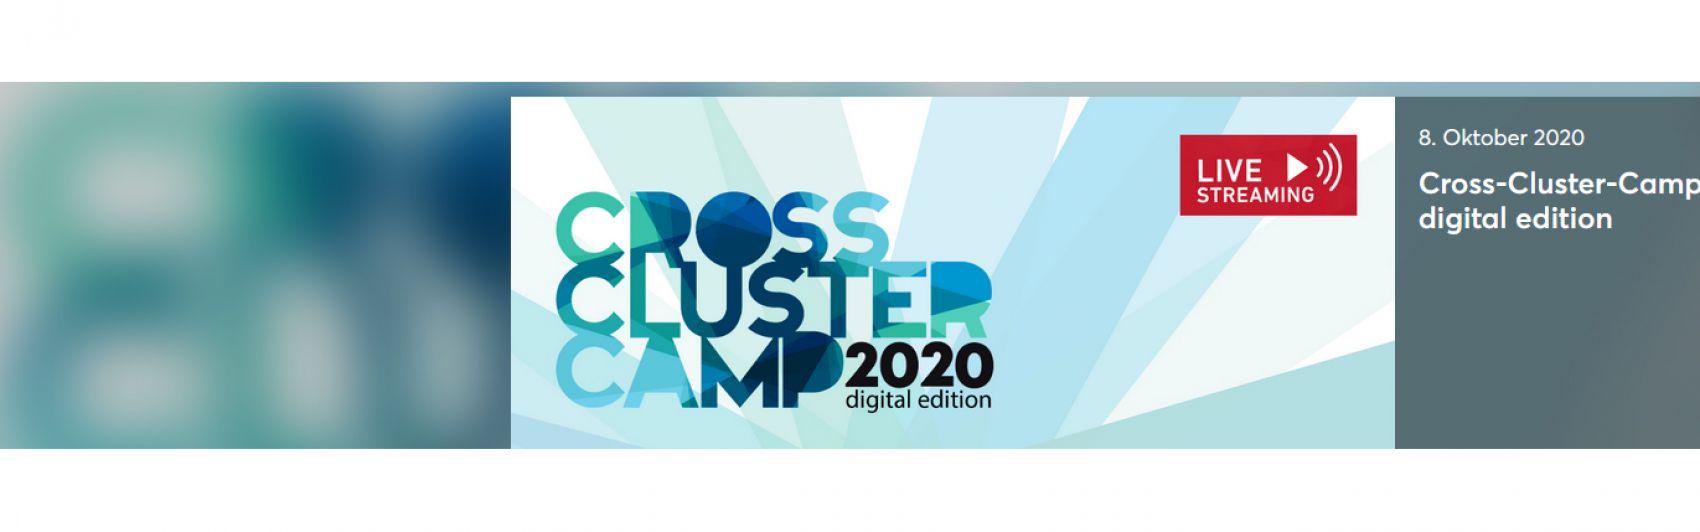 Header Cross Cluster Camp